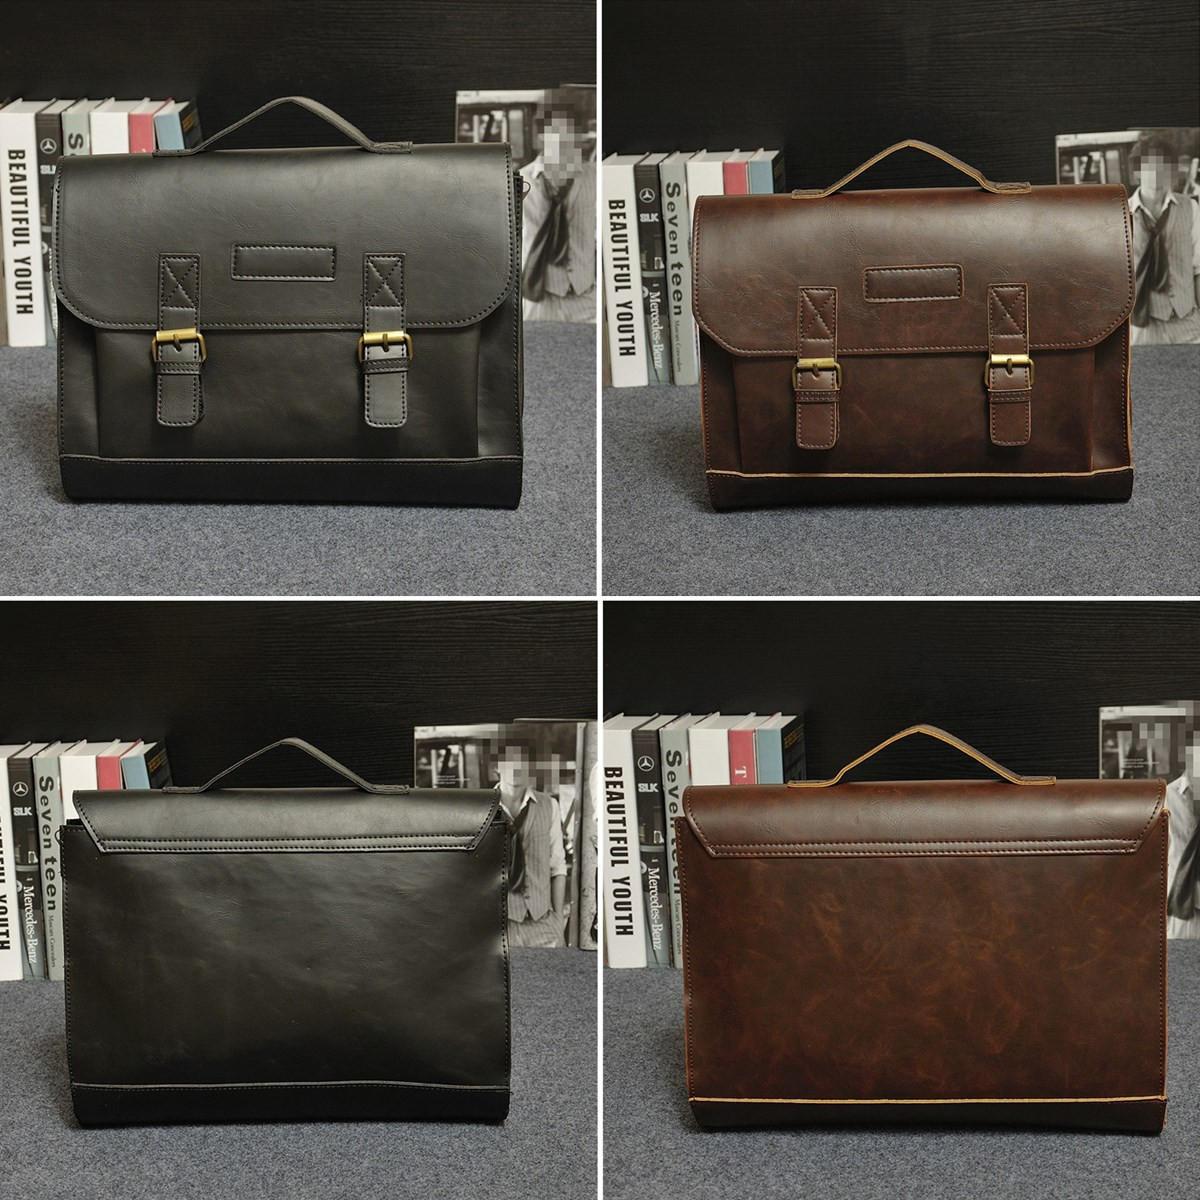 99f70dbbdbde Retro Men Bag PU Leather Men Handbags Casual Business Laptop Bag Messenger Bags  Office Bag COD